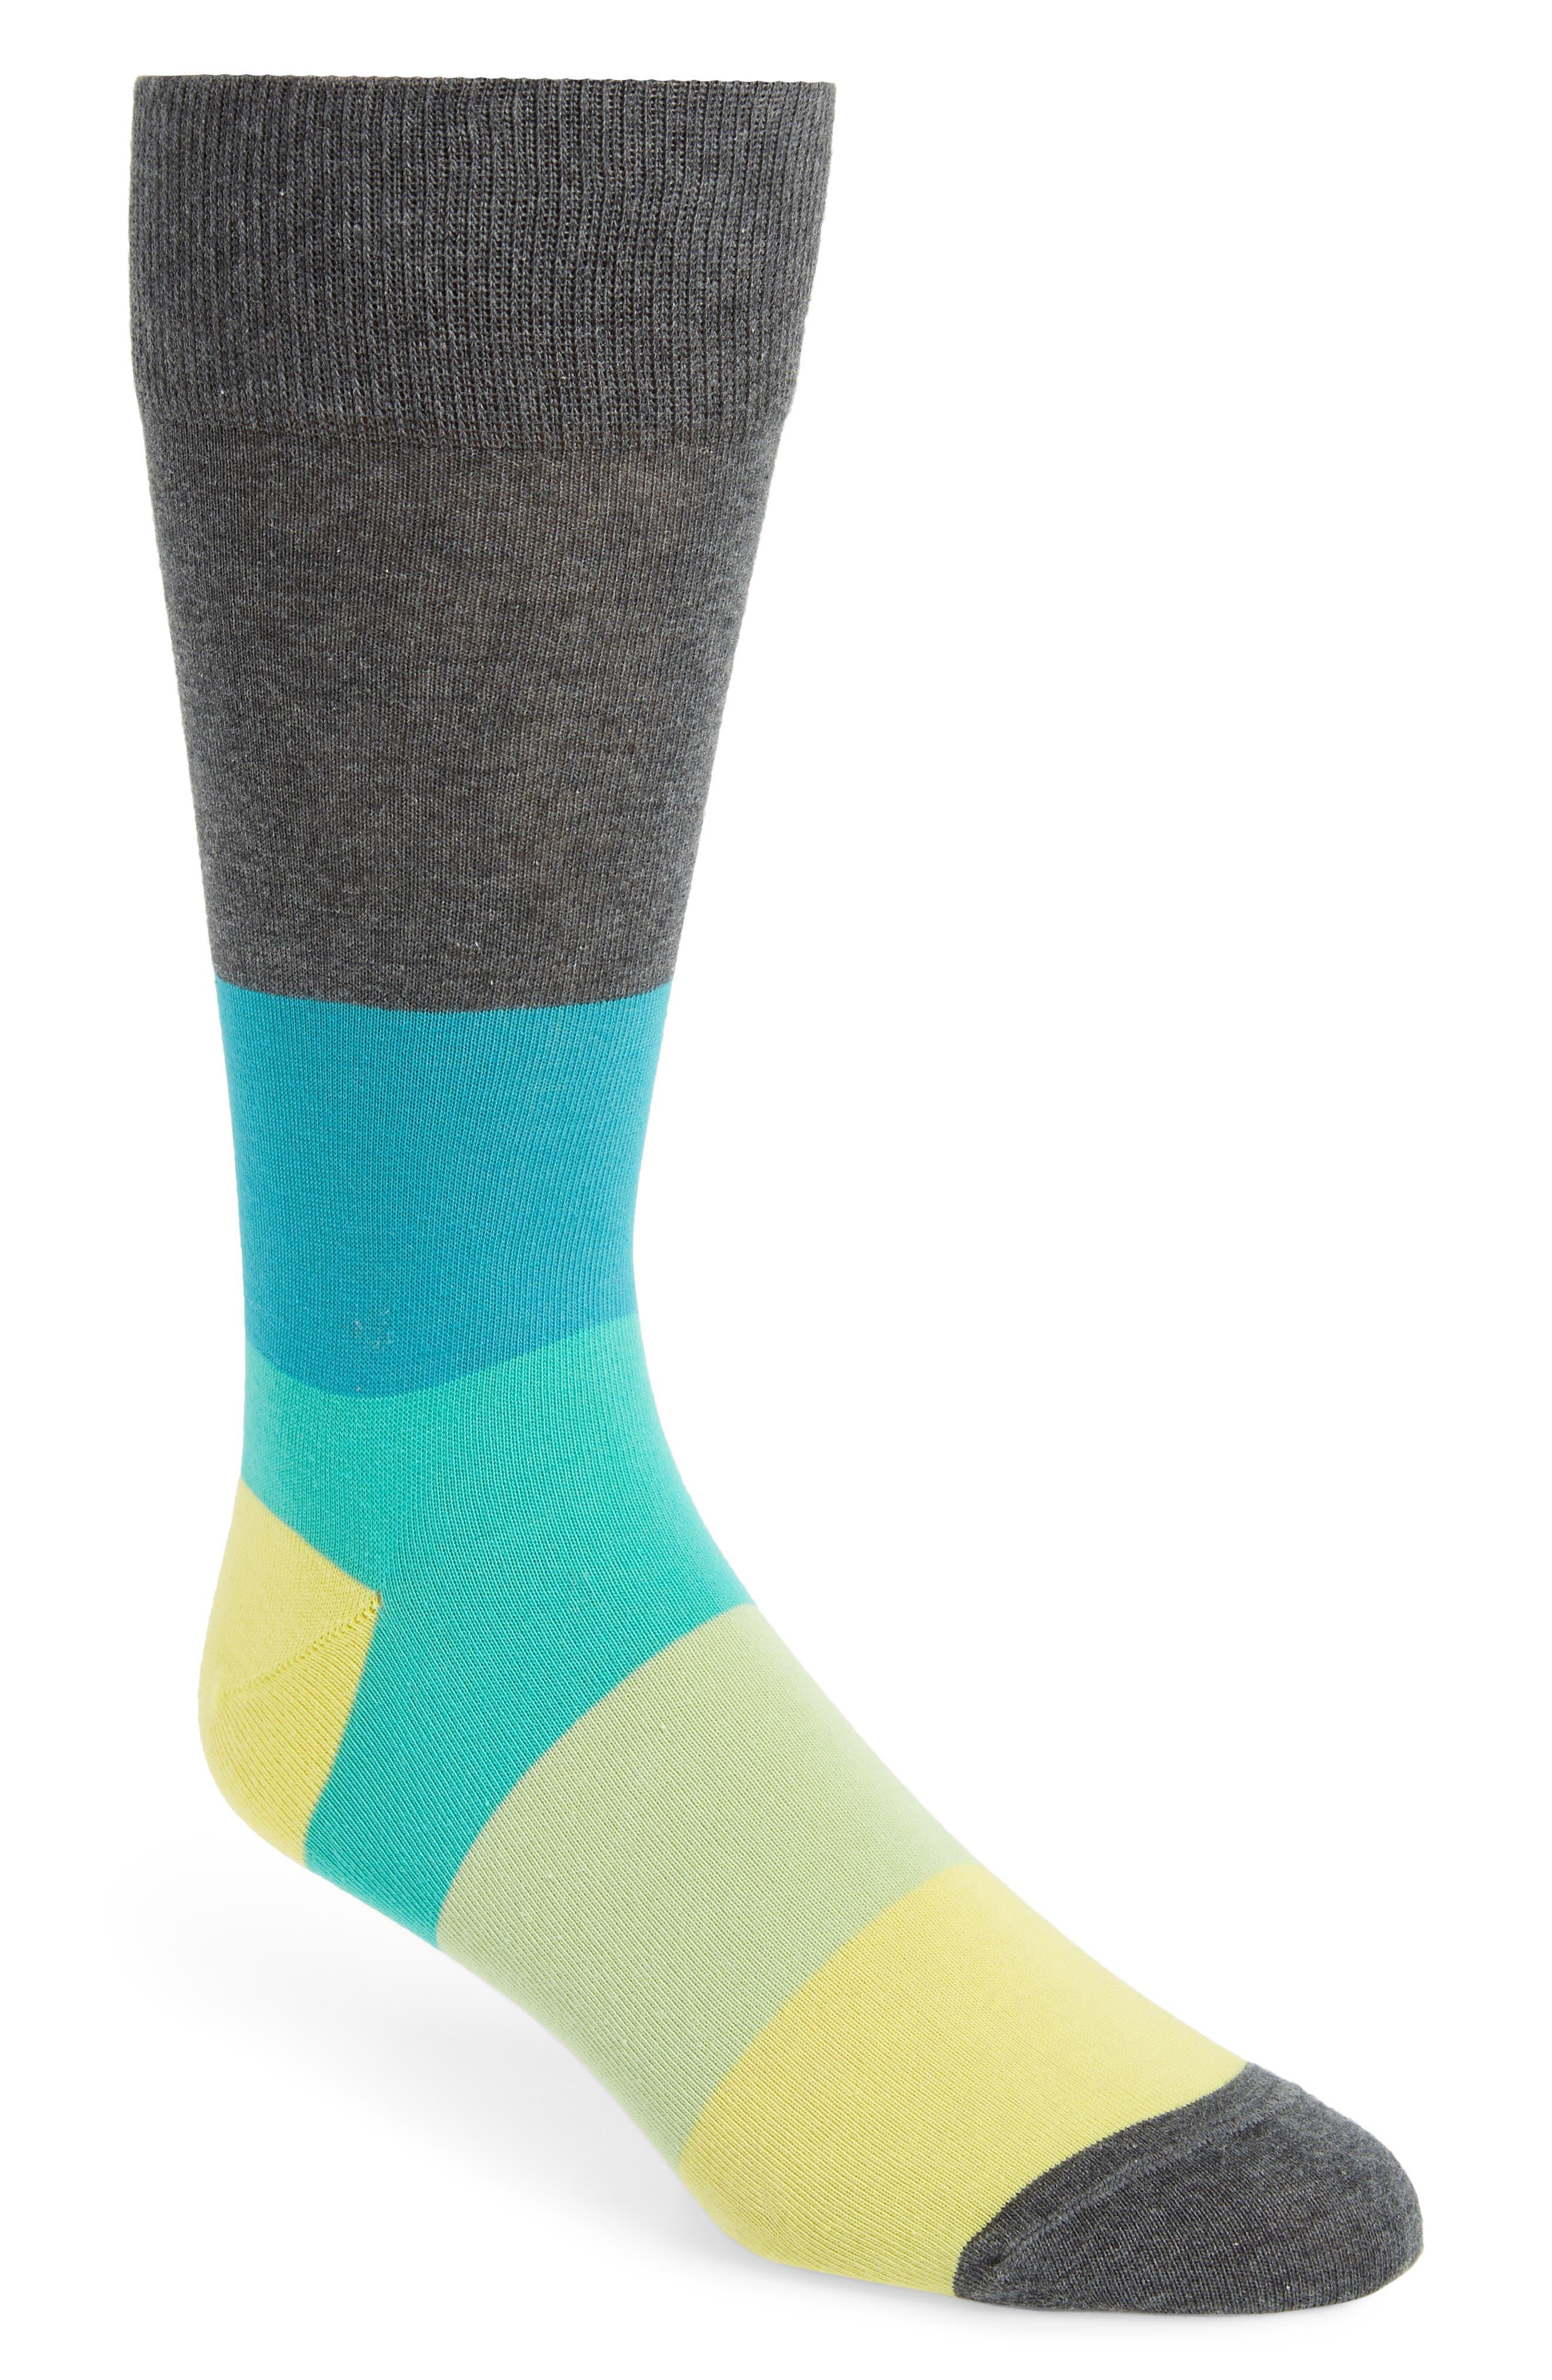 Blocked Ombré Socks,                             Main thumbnail 1, color,                             Charcoal/ Yellow